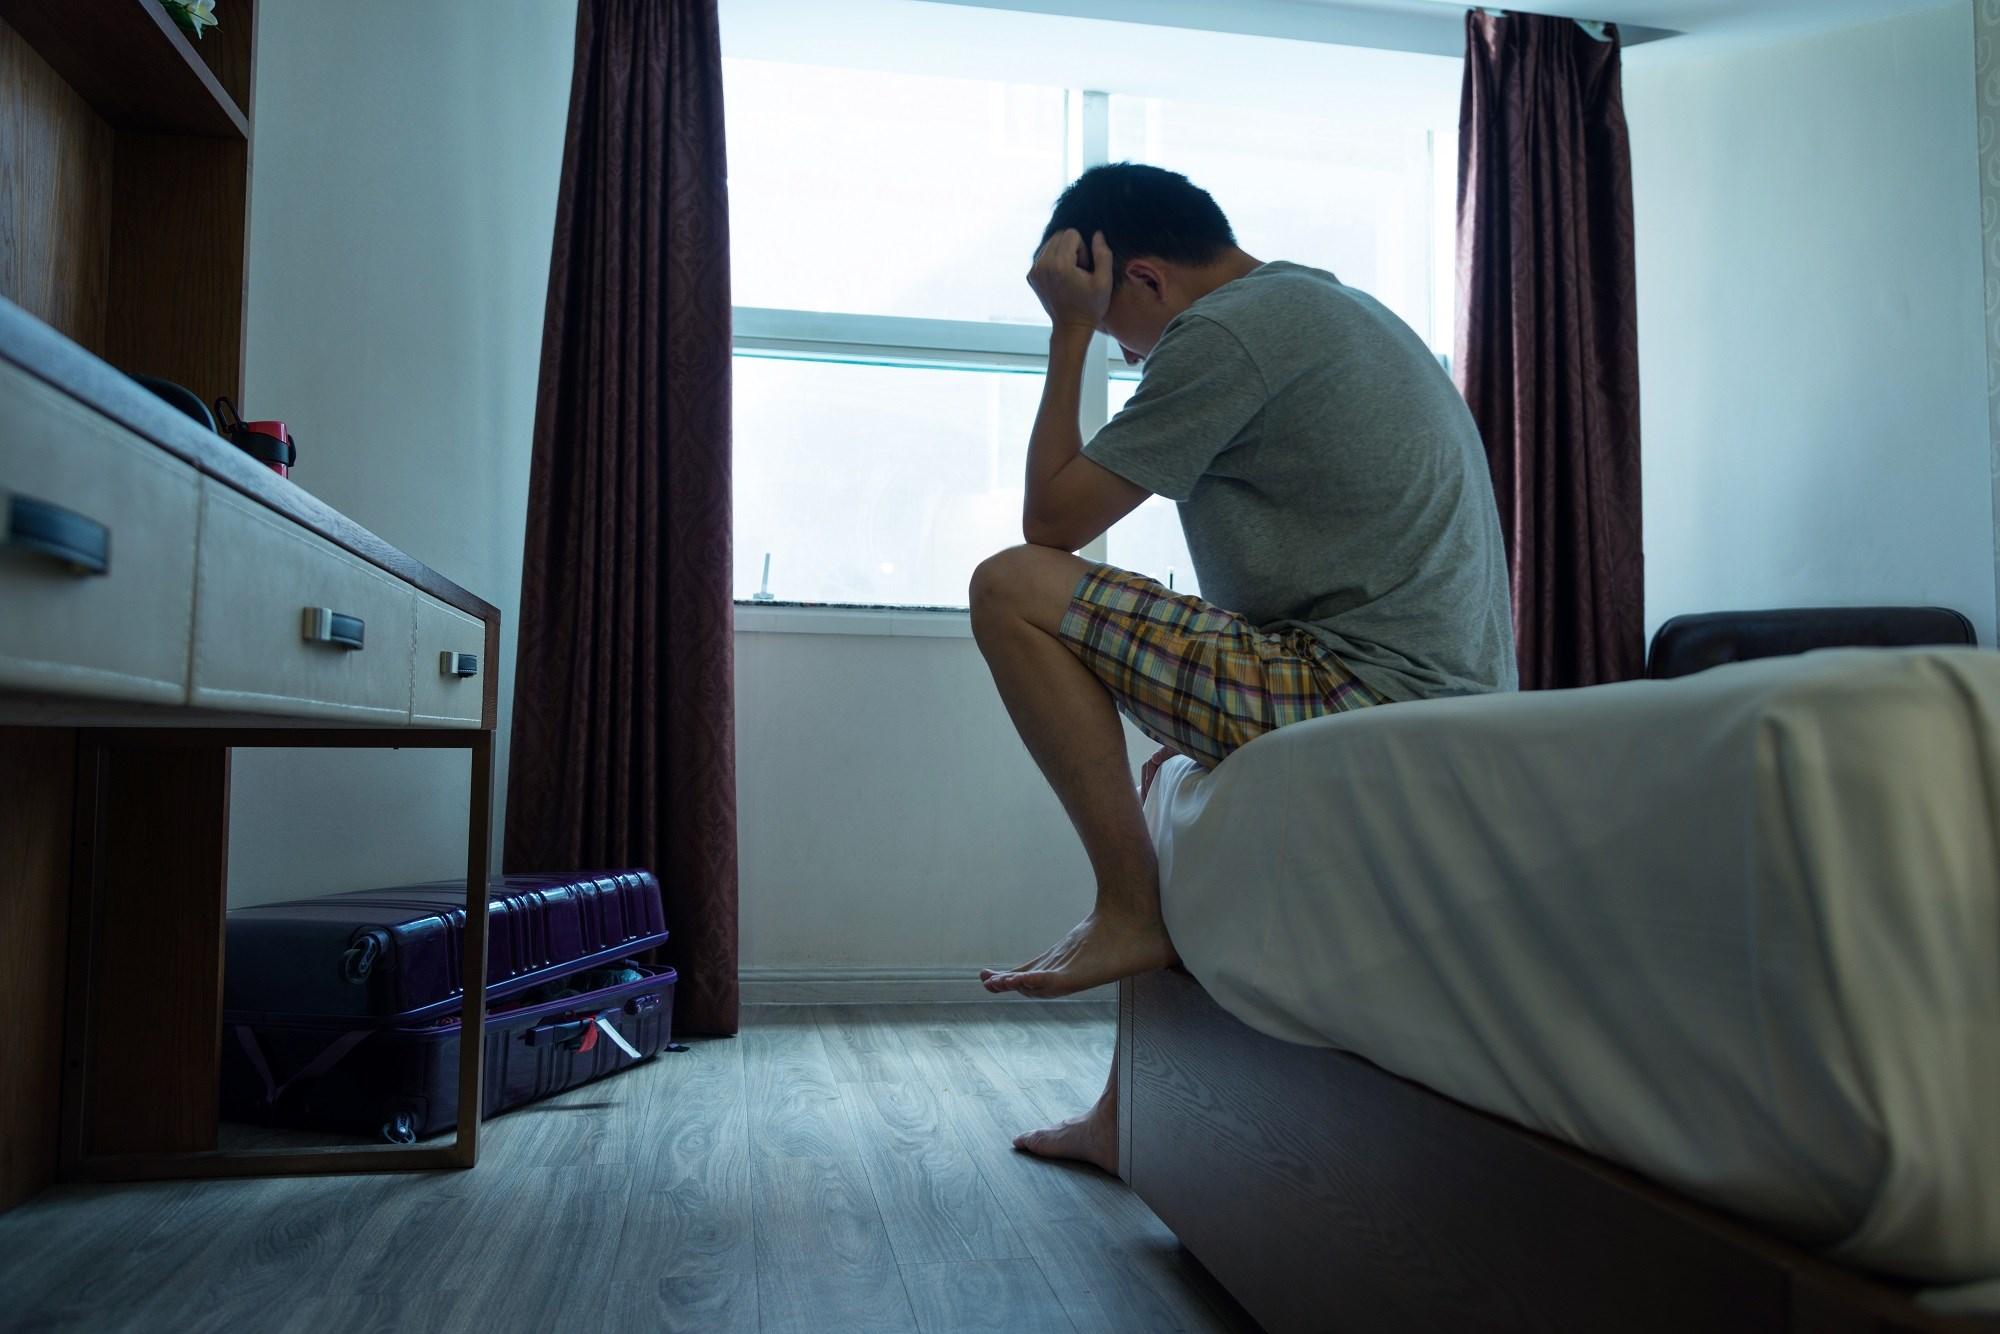 Study IDs Risk Factors for Violent Sleep Disorder